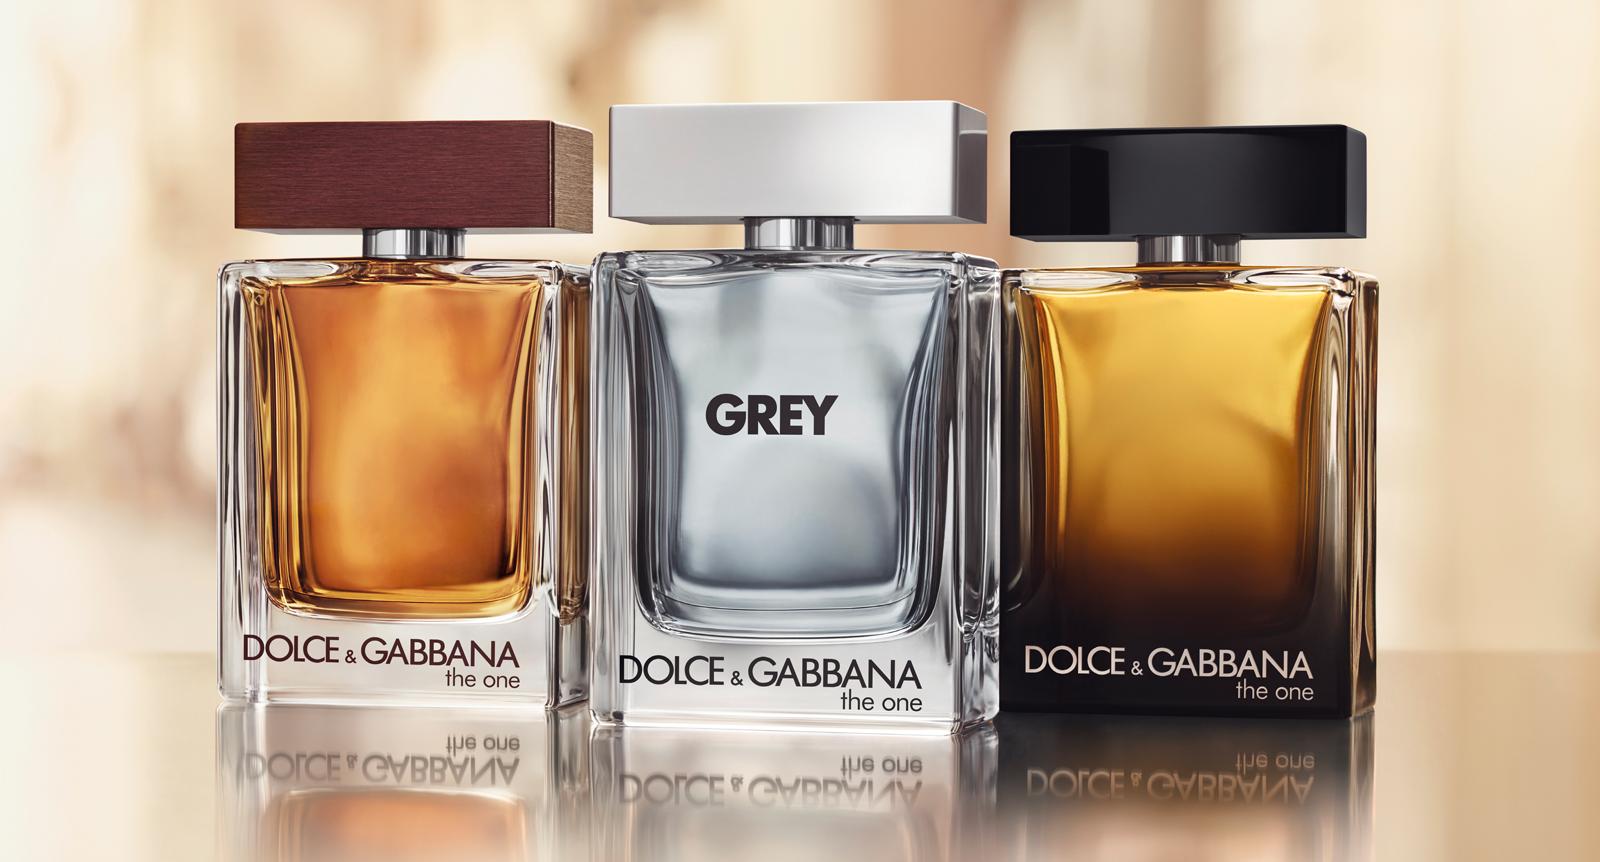 Dolce & Gabbana Beauty – The One Grey